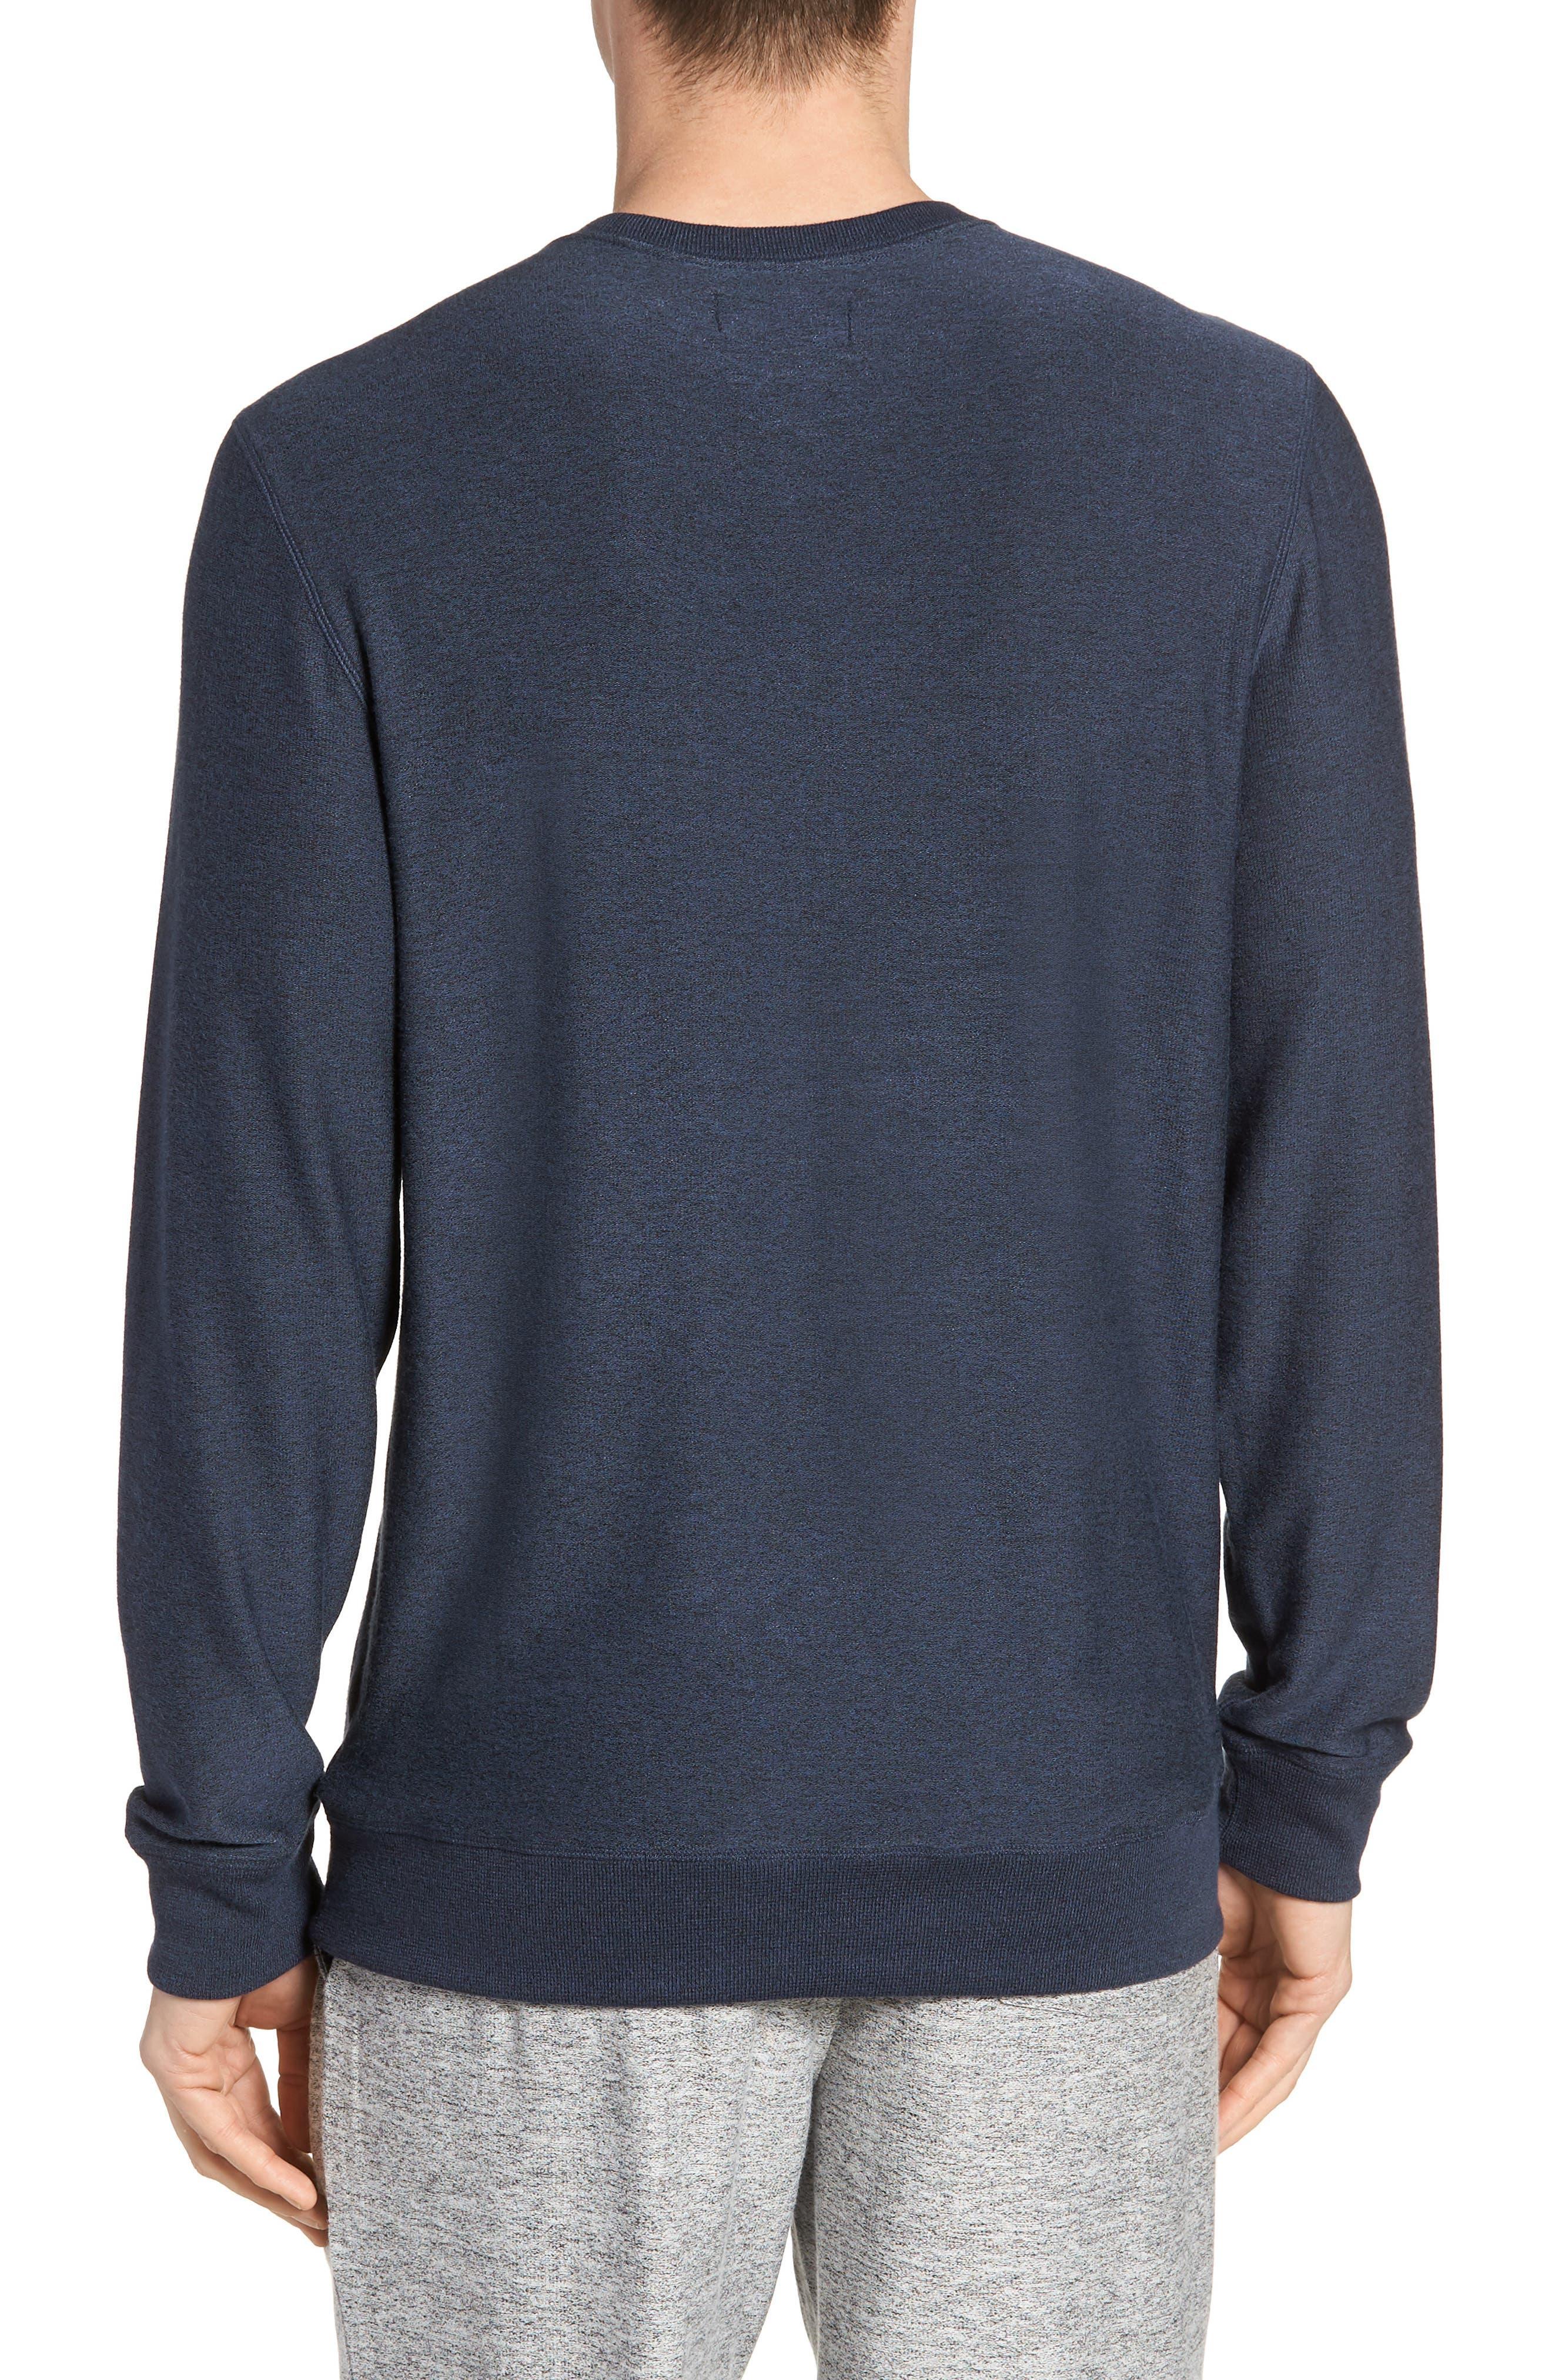 Ultra Soft Crewneck Sweatshirt,                             Alternate thumbnail 2, color,                             Navy Indigo Marl